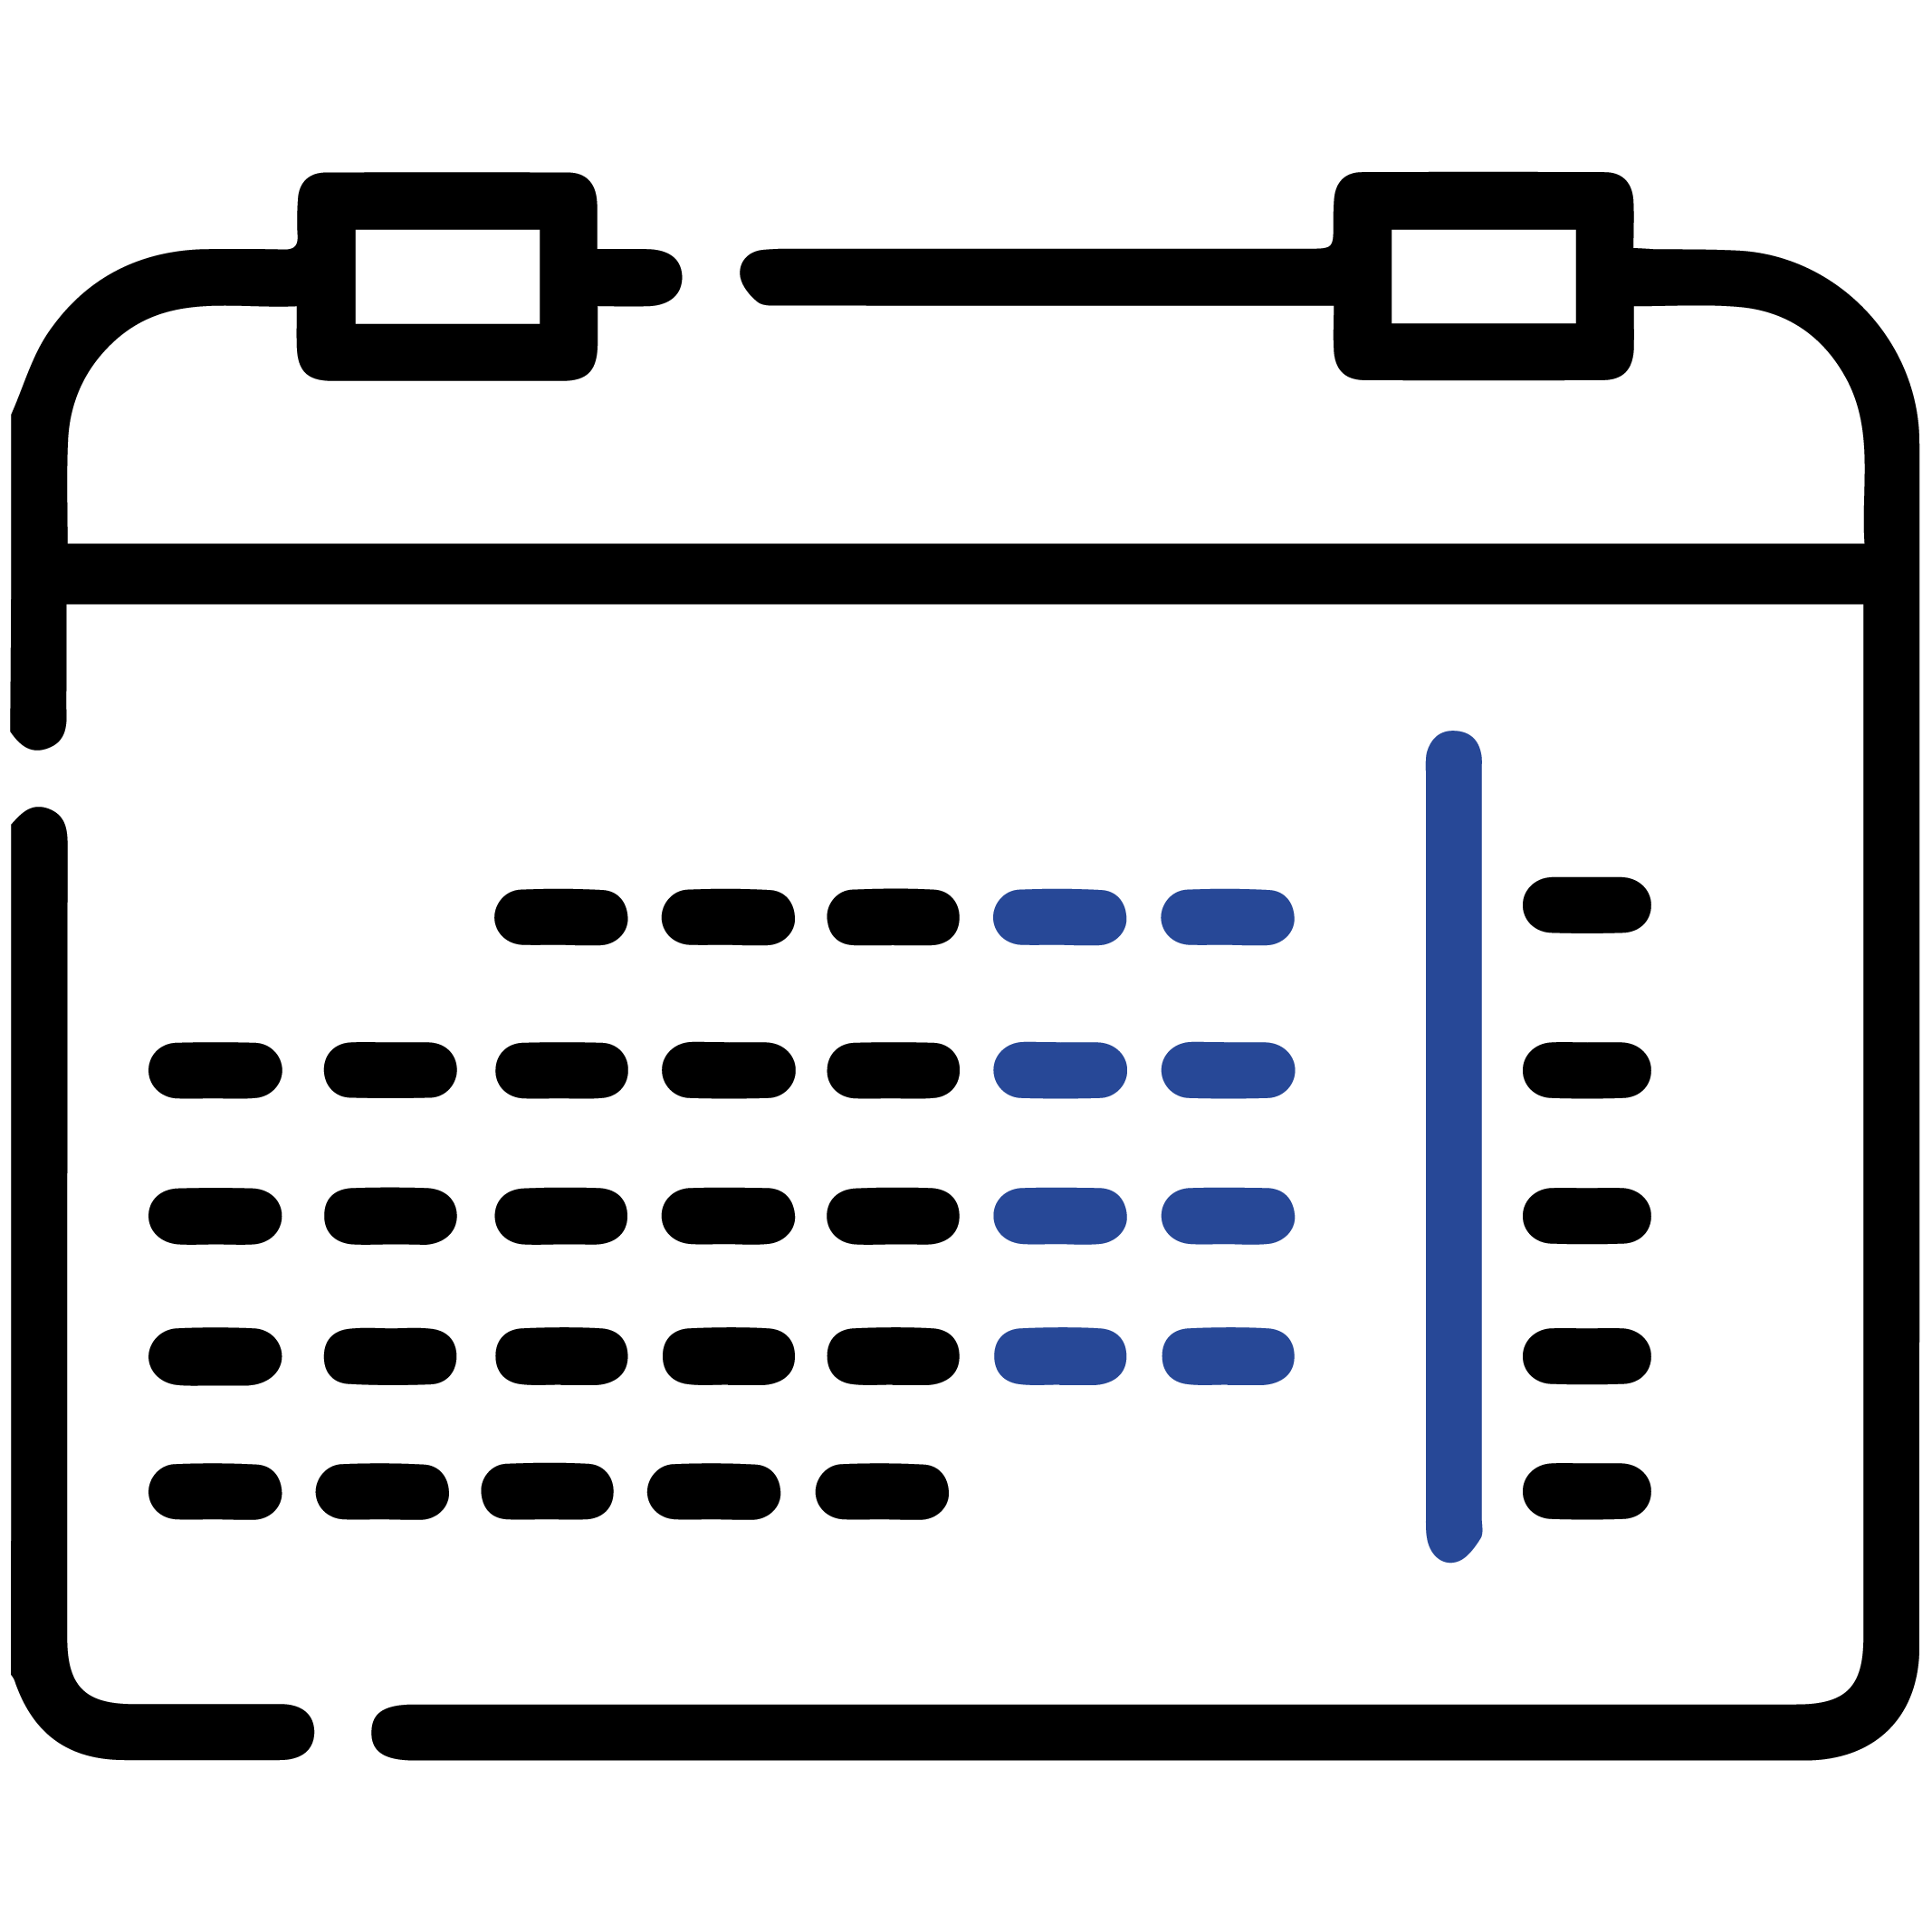 agendamento-01 azul-01